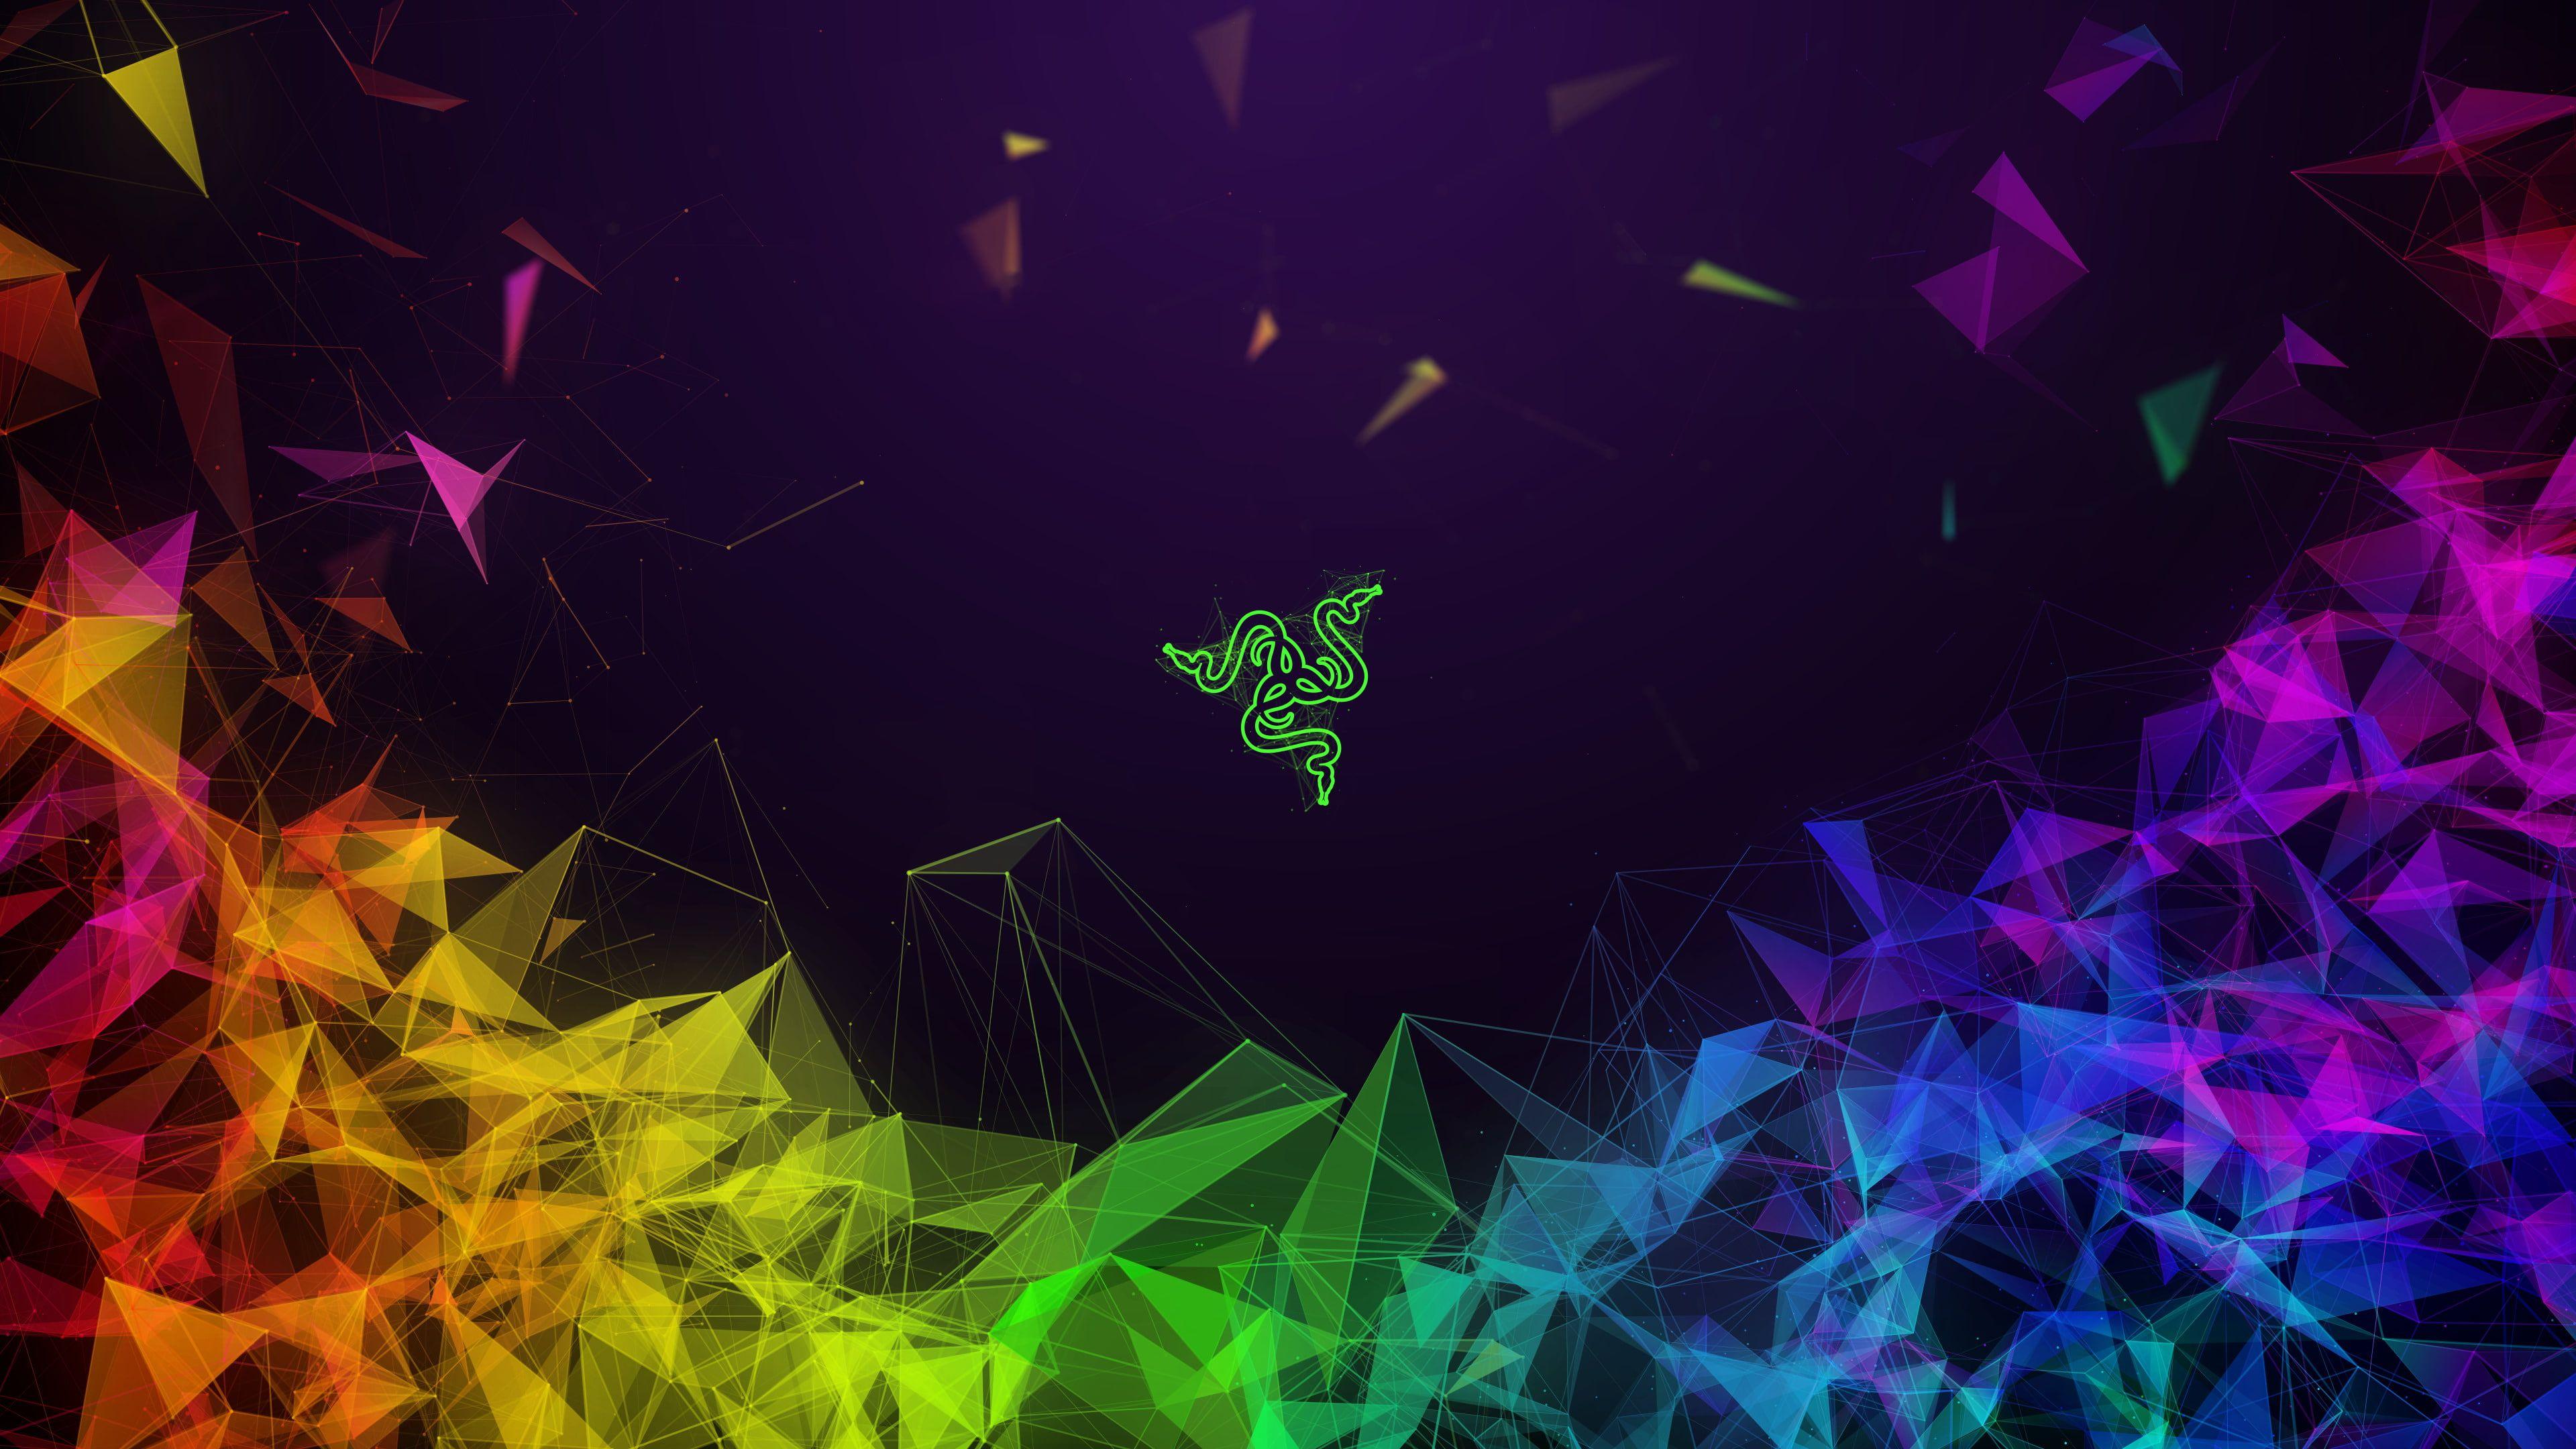 Razer Blade 15 Gaming Laptop Abstract Colorful Vibrant Dark Hd 4k 4k Wallpaper Hdwallpaper Desktop In 2020 Uhd Wallpaper Gaming Wallpapers Wallpaper Pc